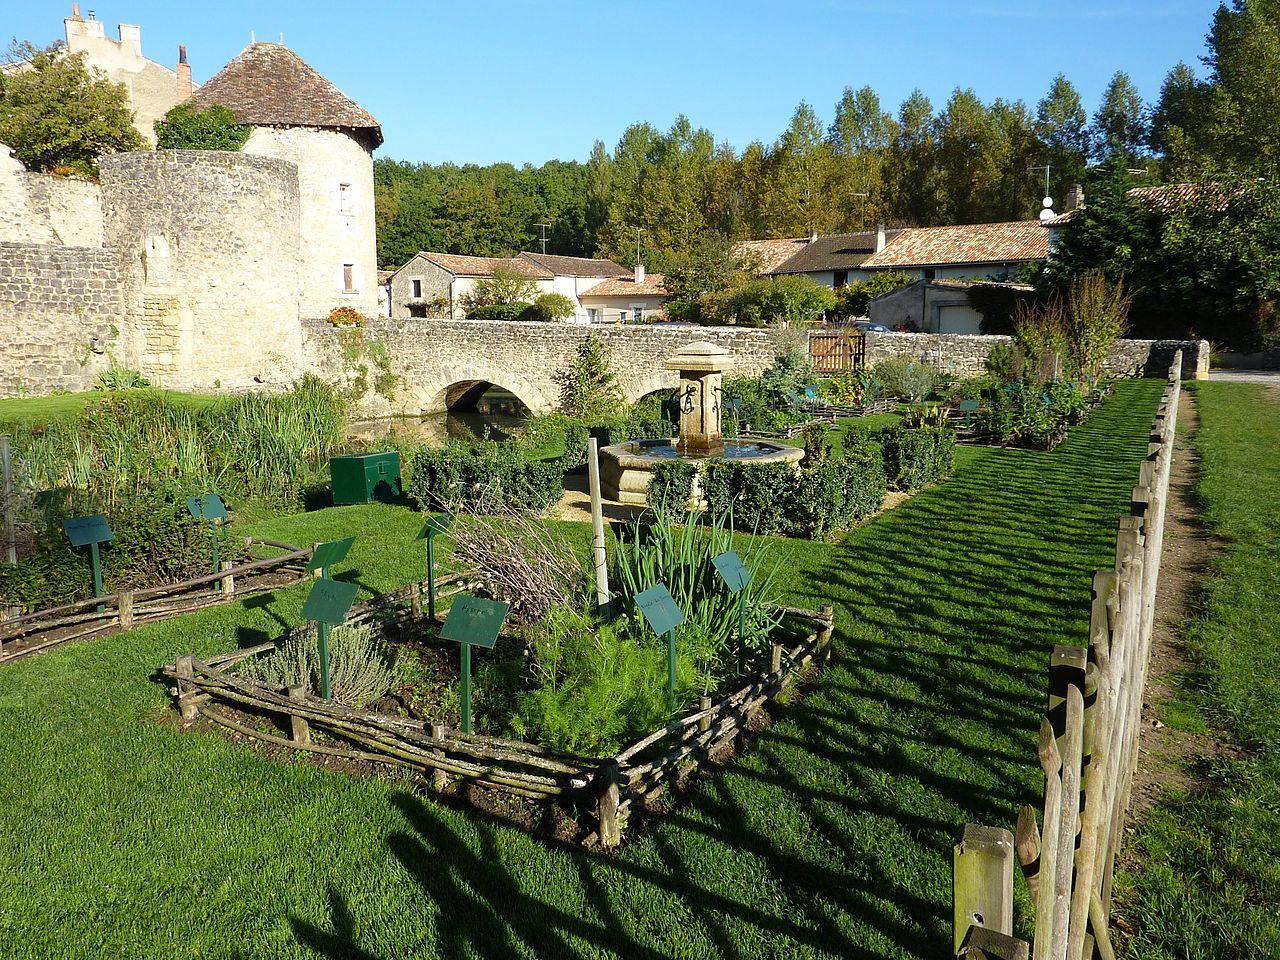 file jardin m di val nouaill maupertuis jpg wikimedia